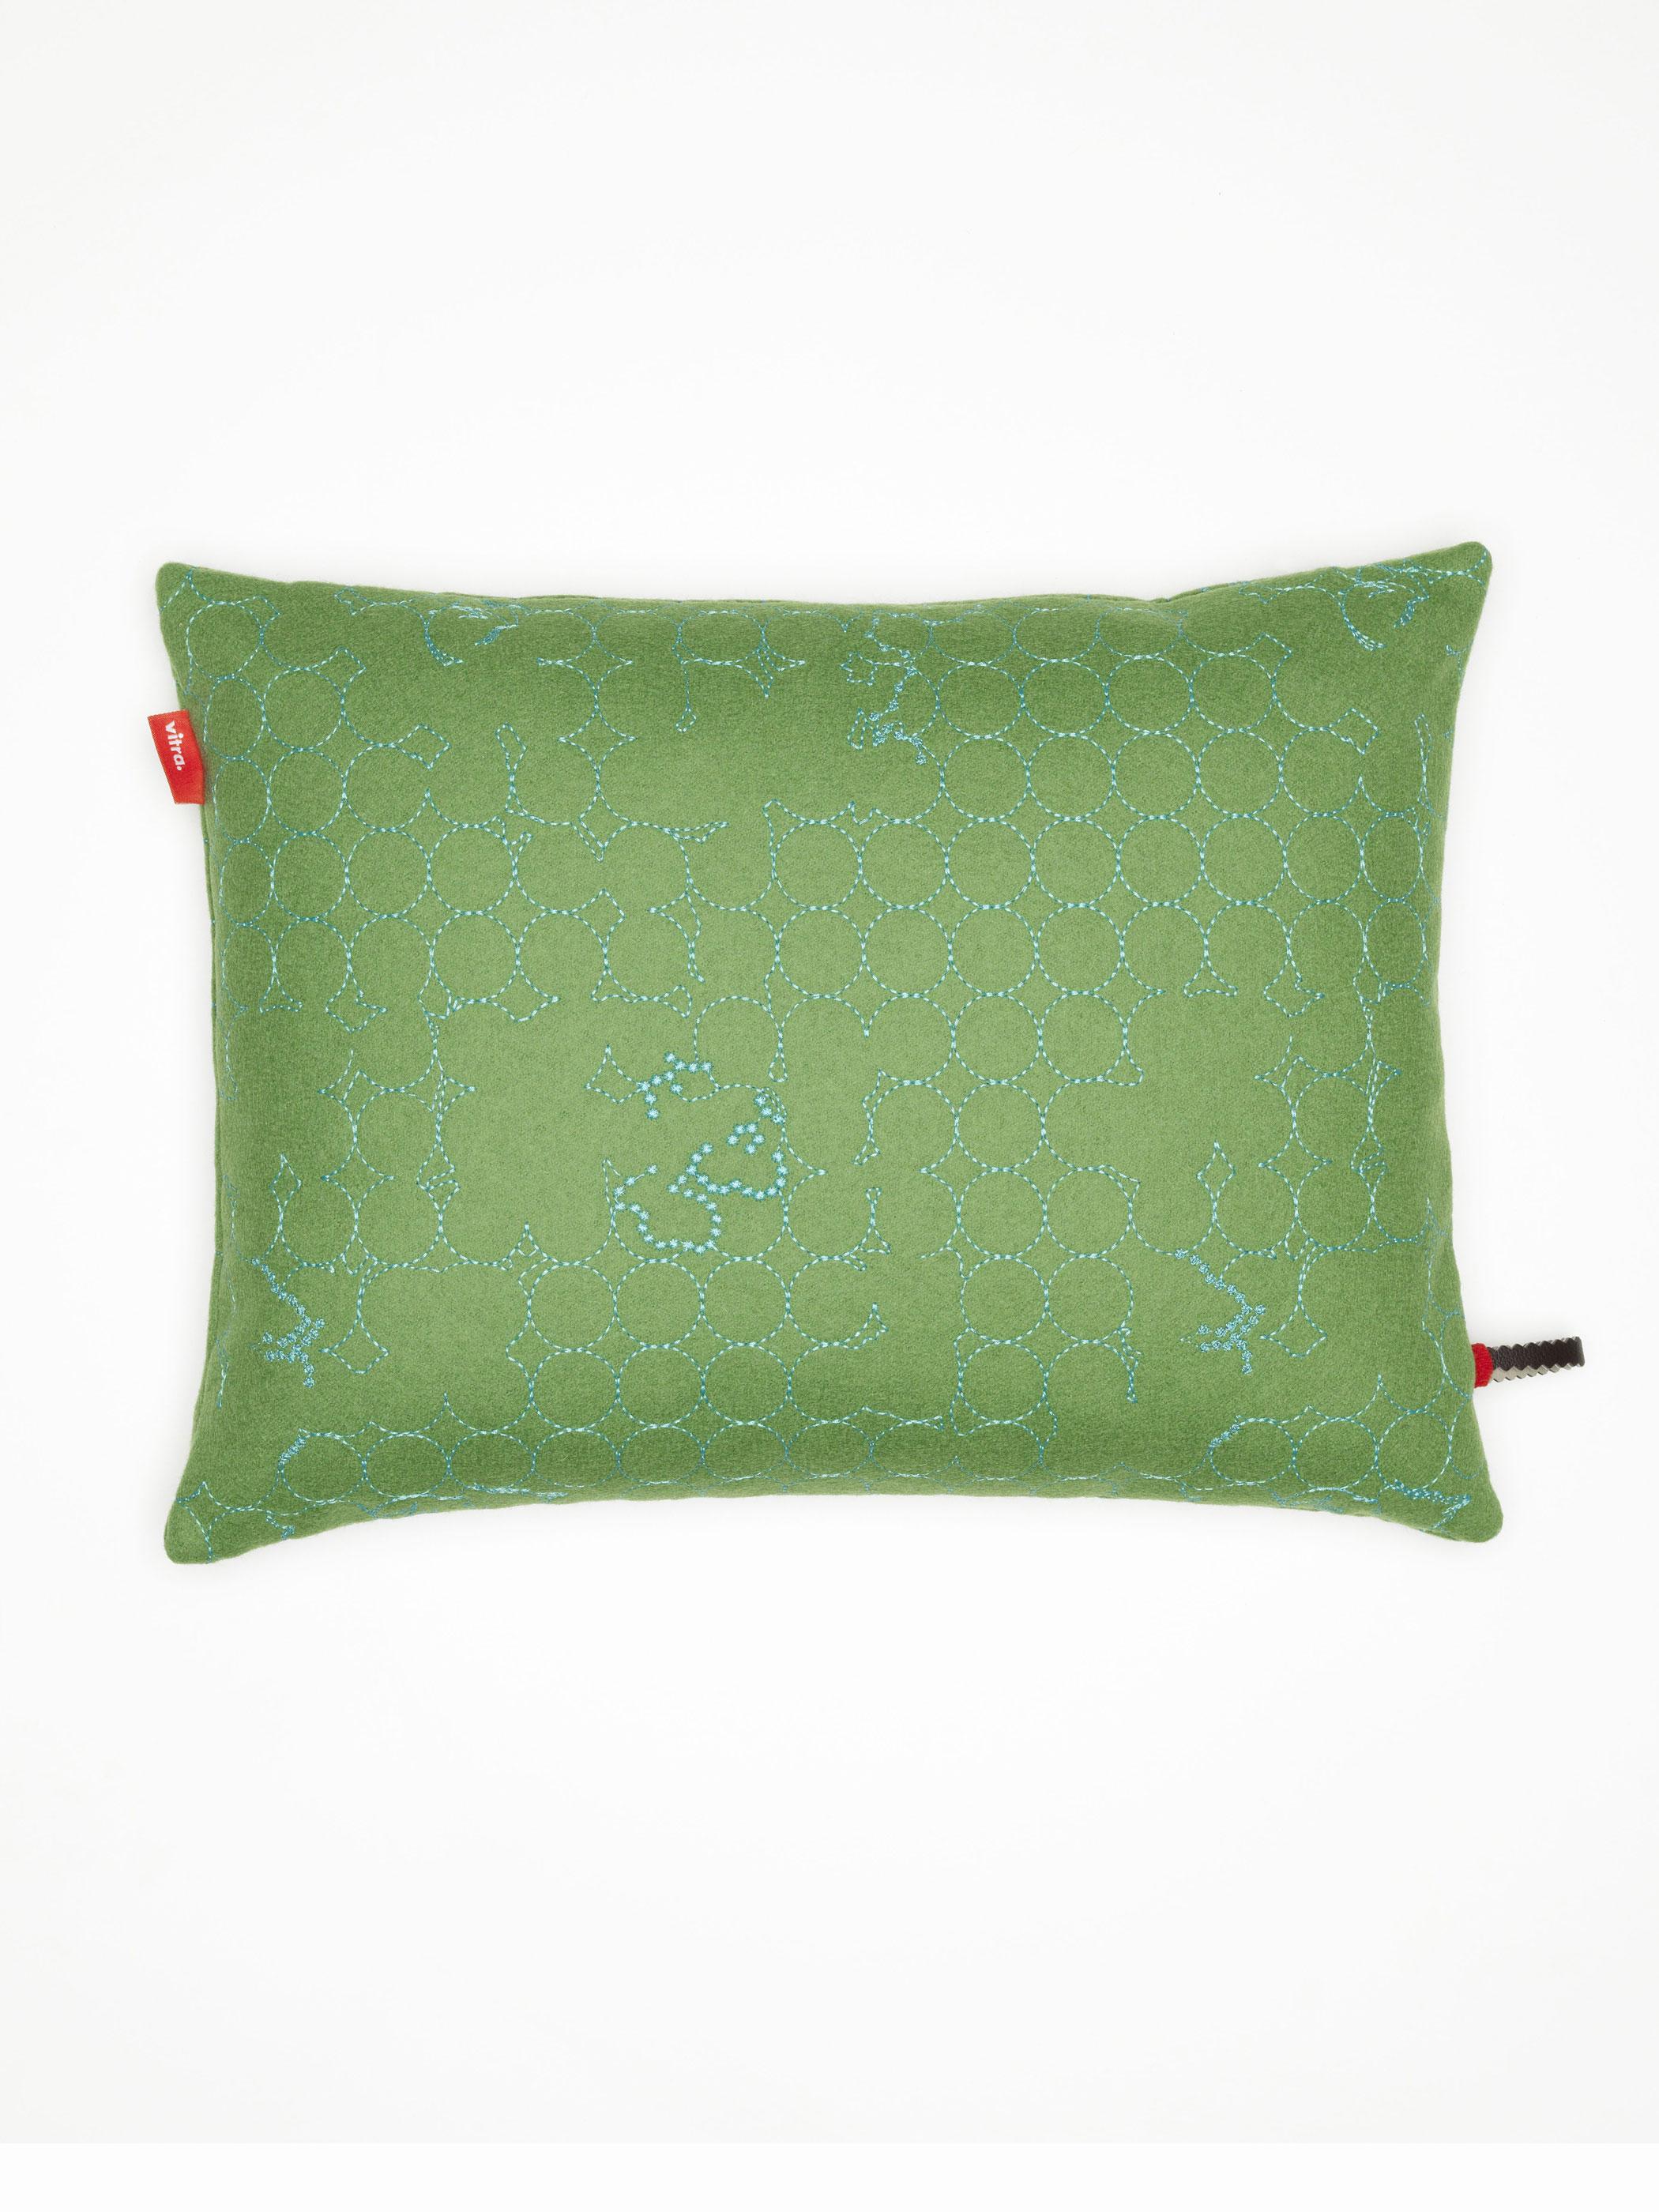 vitra kissen maharam layers vineyard jade turquoise produktdetails. Black Bedroom Furniture Sets. Home Design Ideas